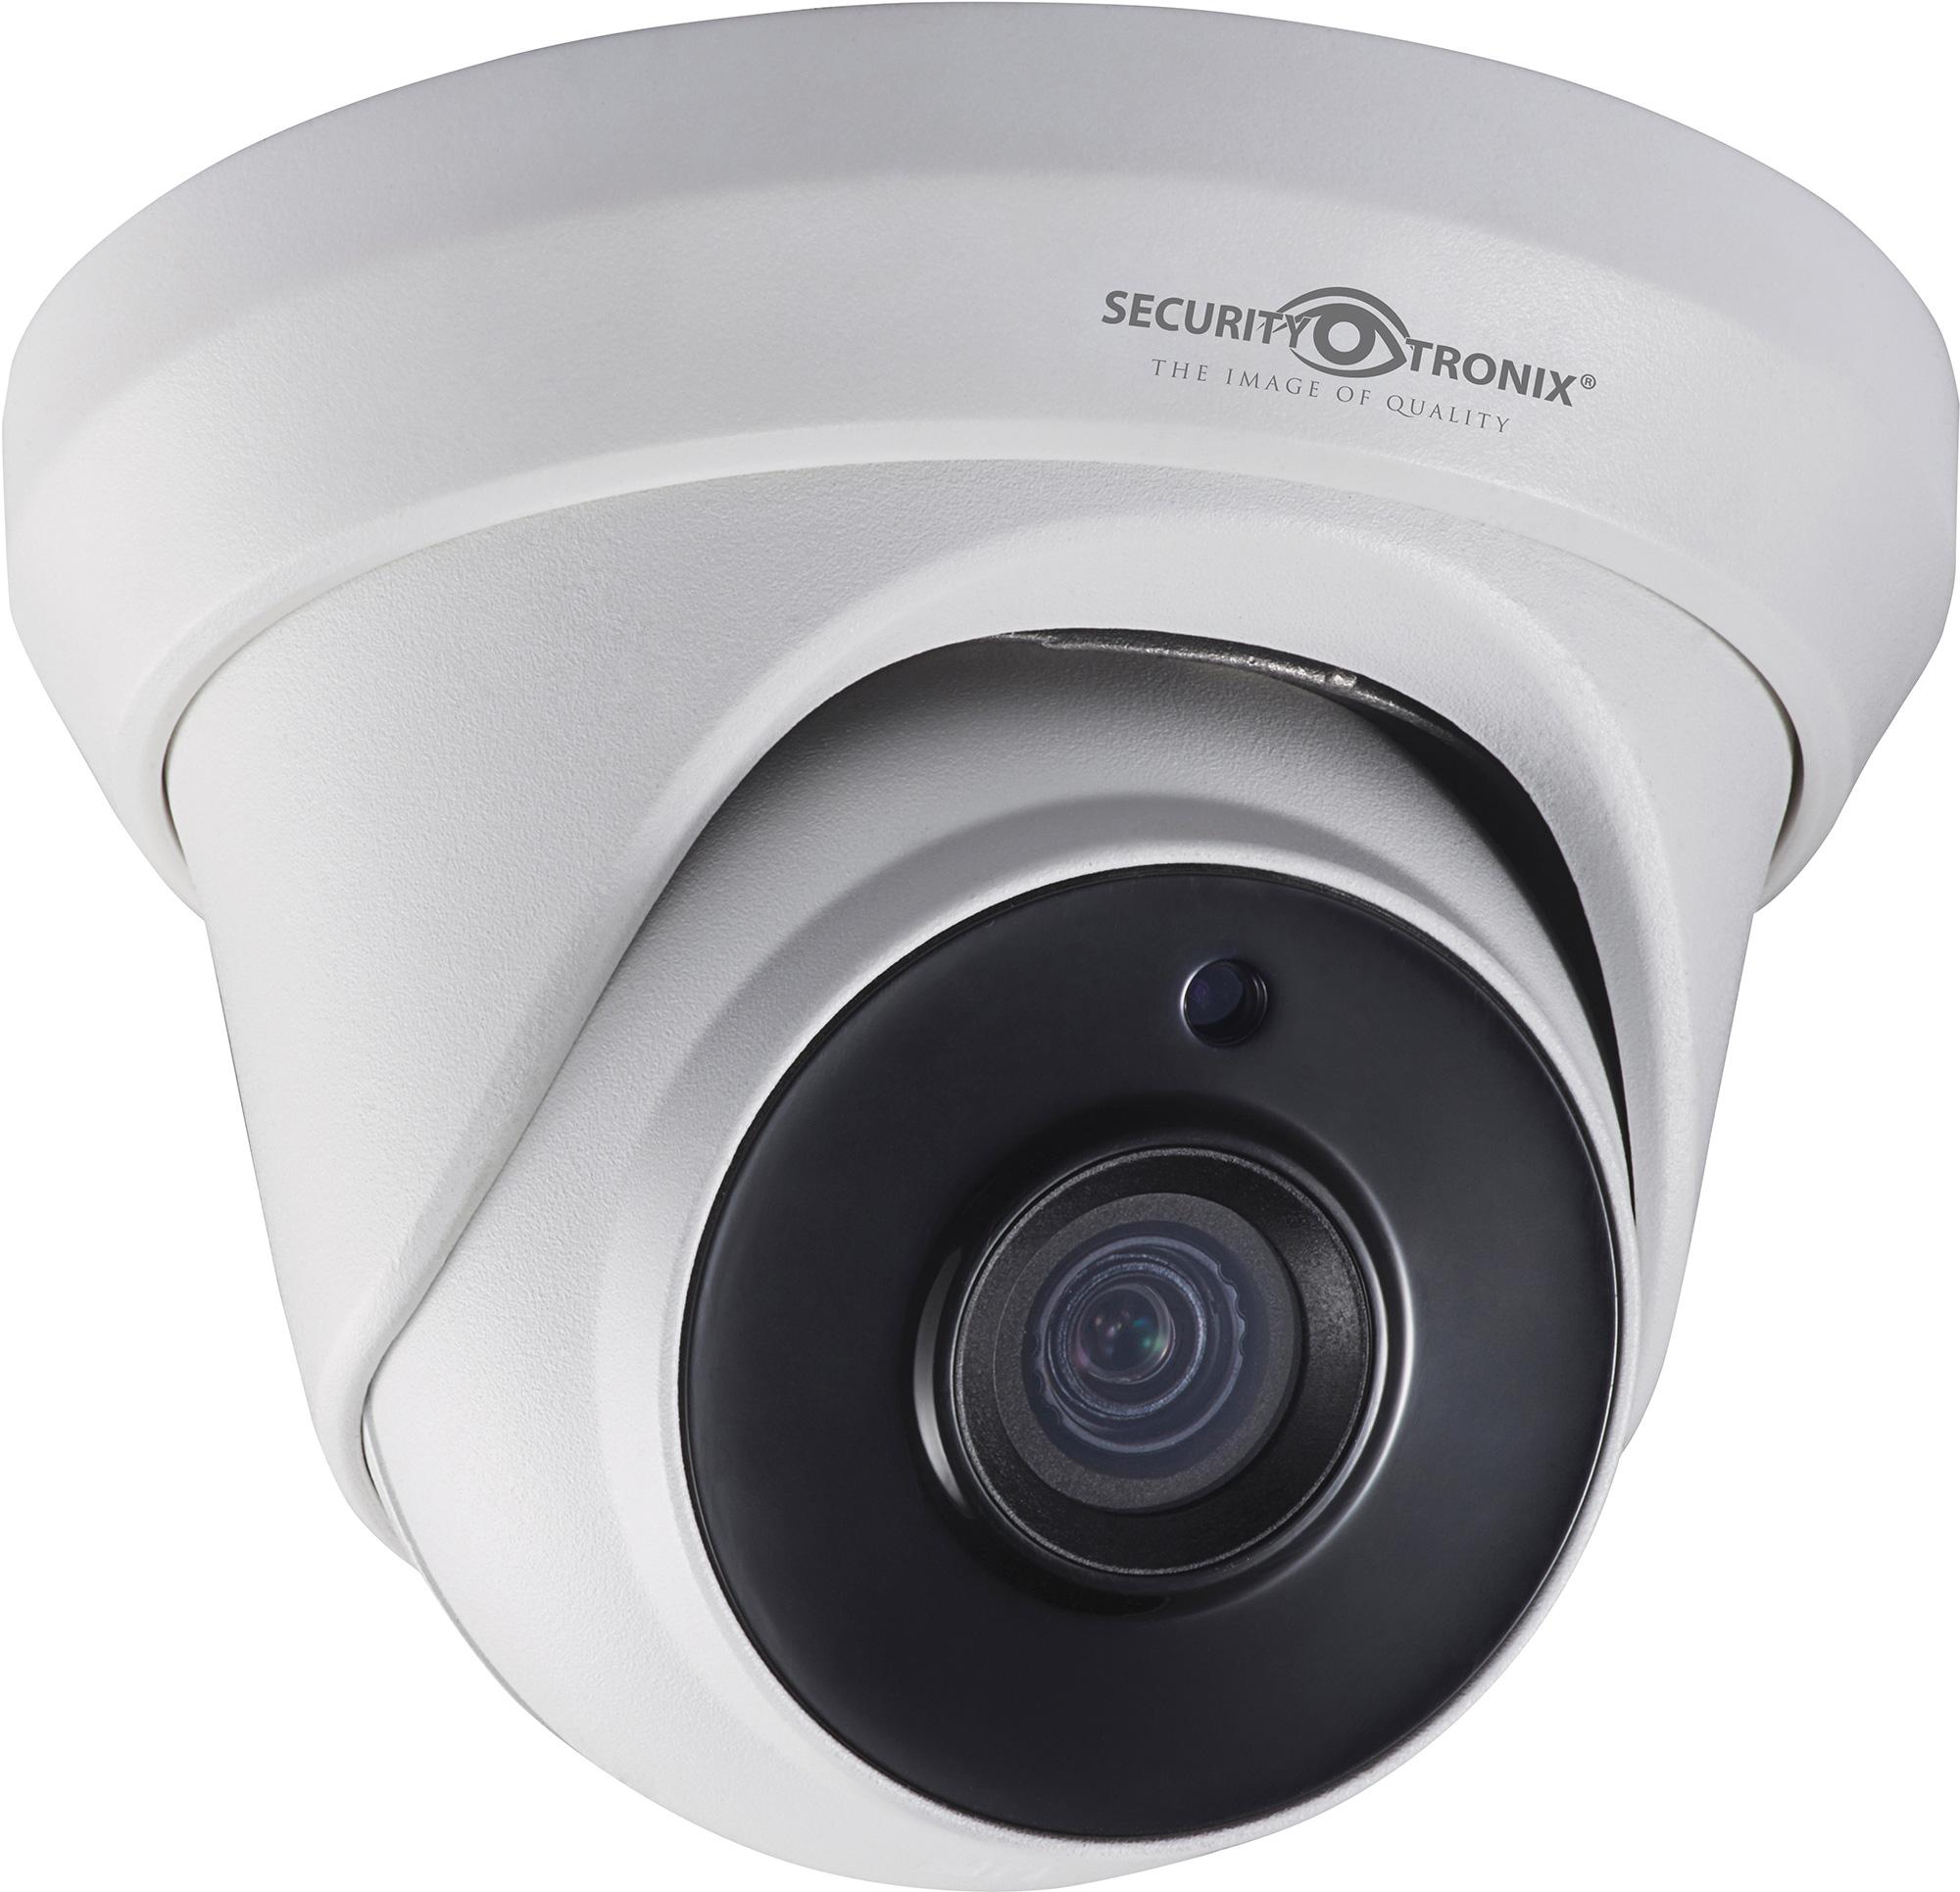 SecurityTronix ST-HDC2FTD-2.8 2MP HD-TVI Fixed Lens Turret Dome Camera SCT-ST-HDC2FTD28